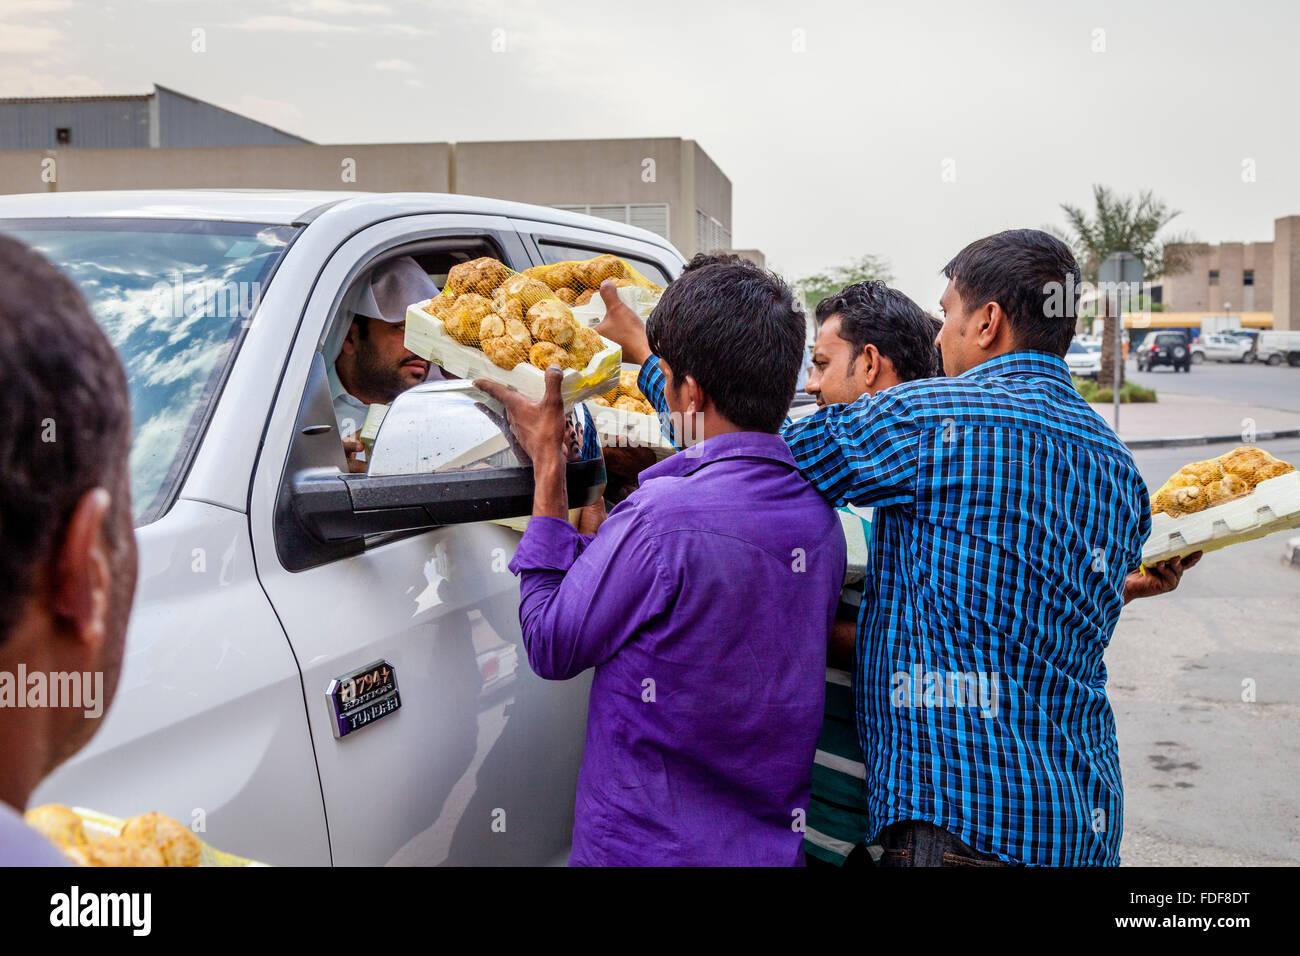 Bangladeshi Migrant Workers Sell Imported Truffles To Local Qataris, The Municipal Market, Doha, Qatar - Stock Image